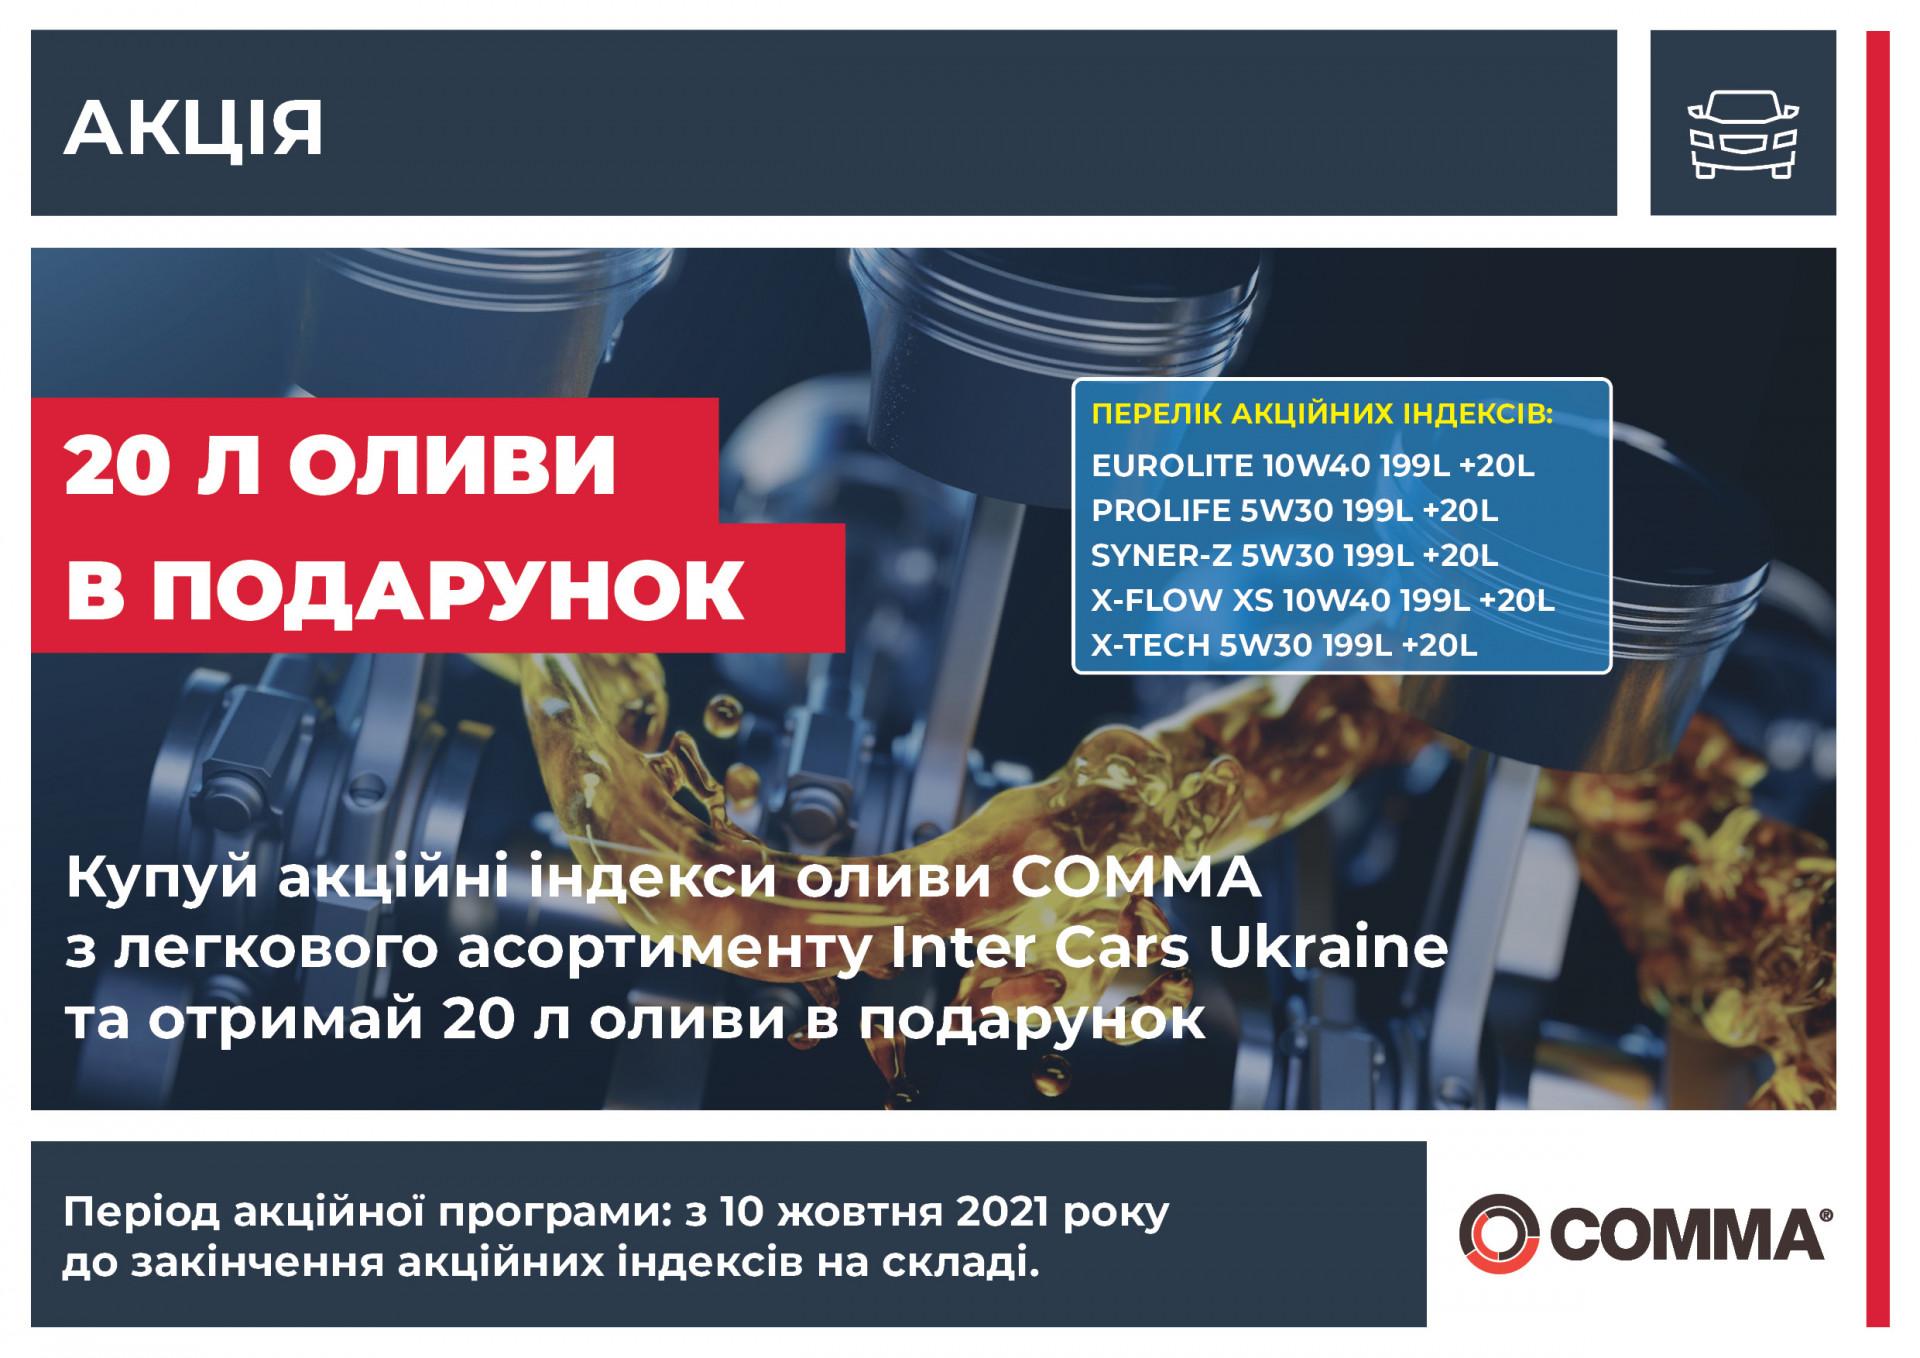 A5_20211005 Comma_PKW_2.jpg